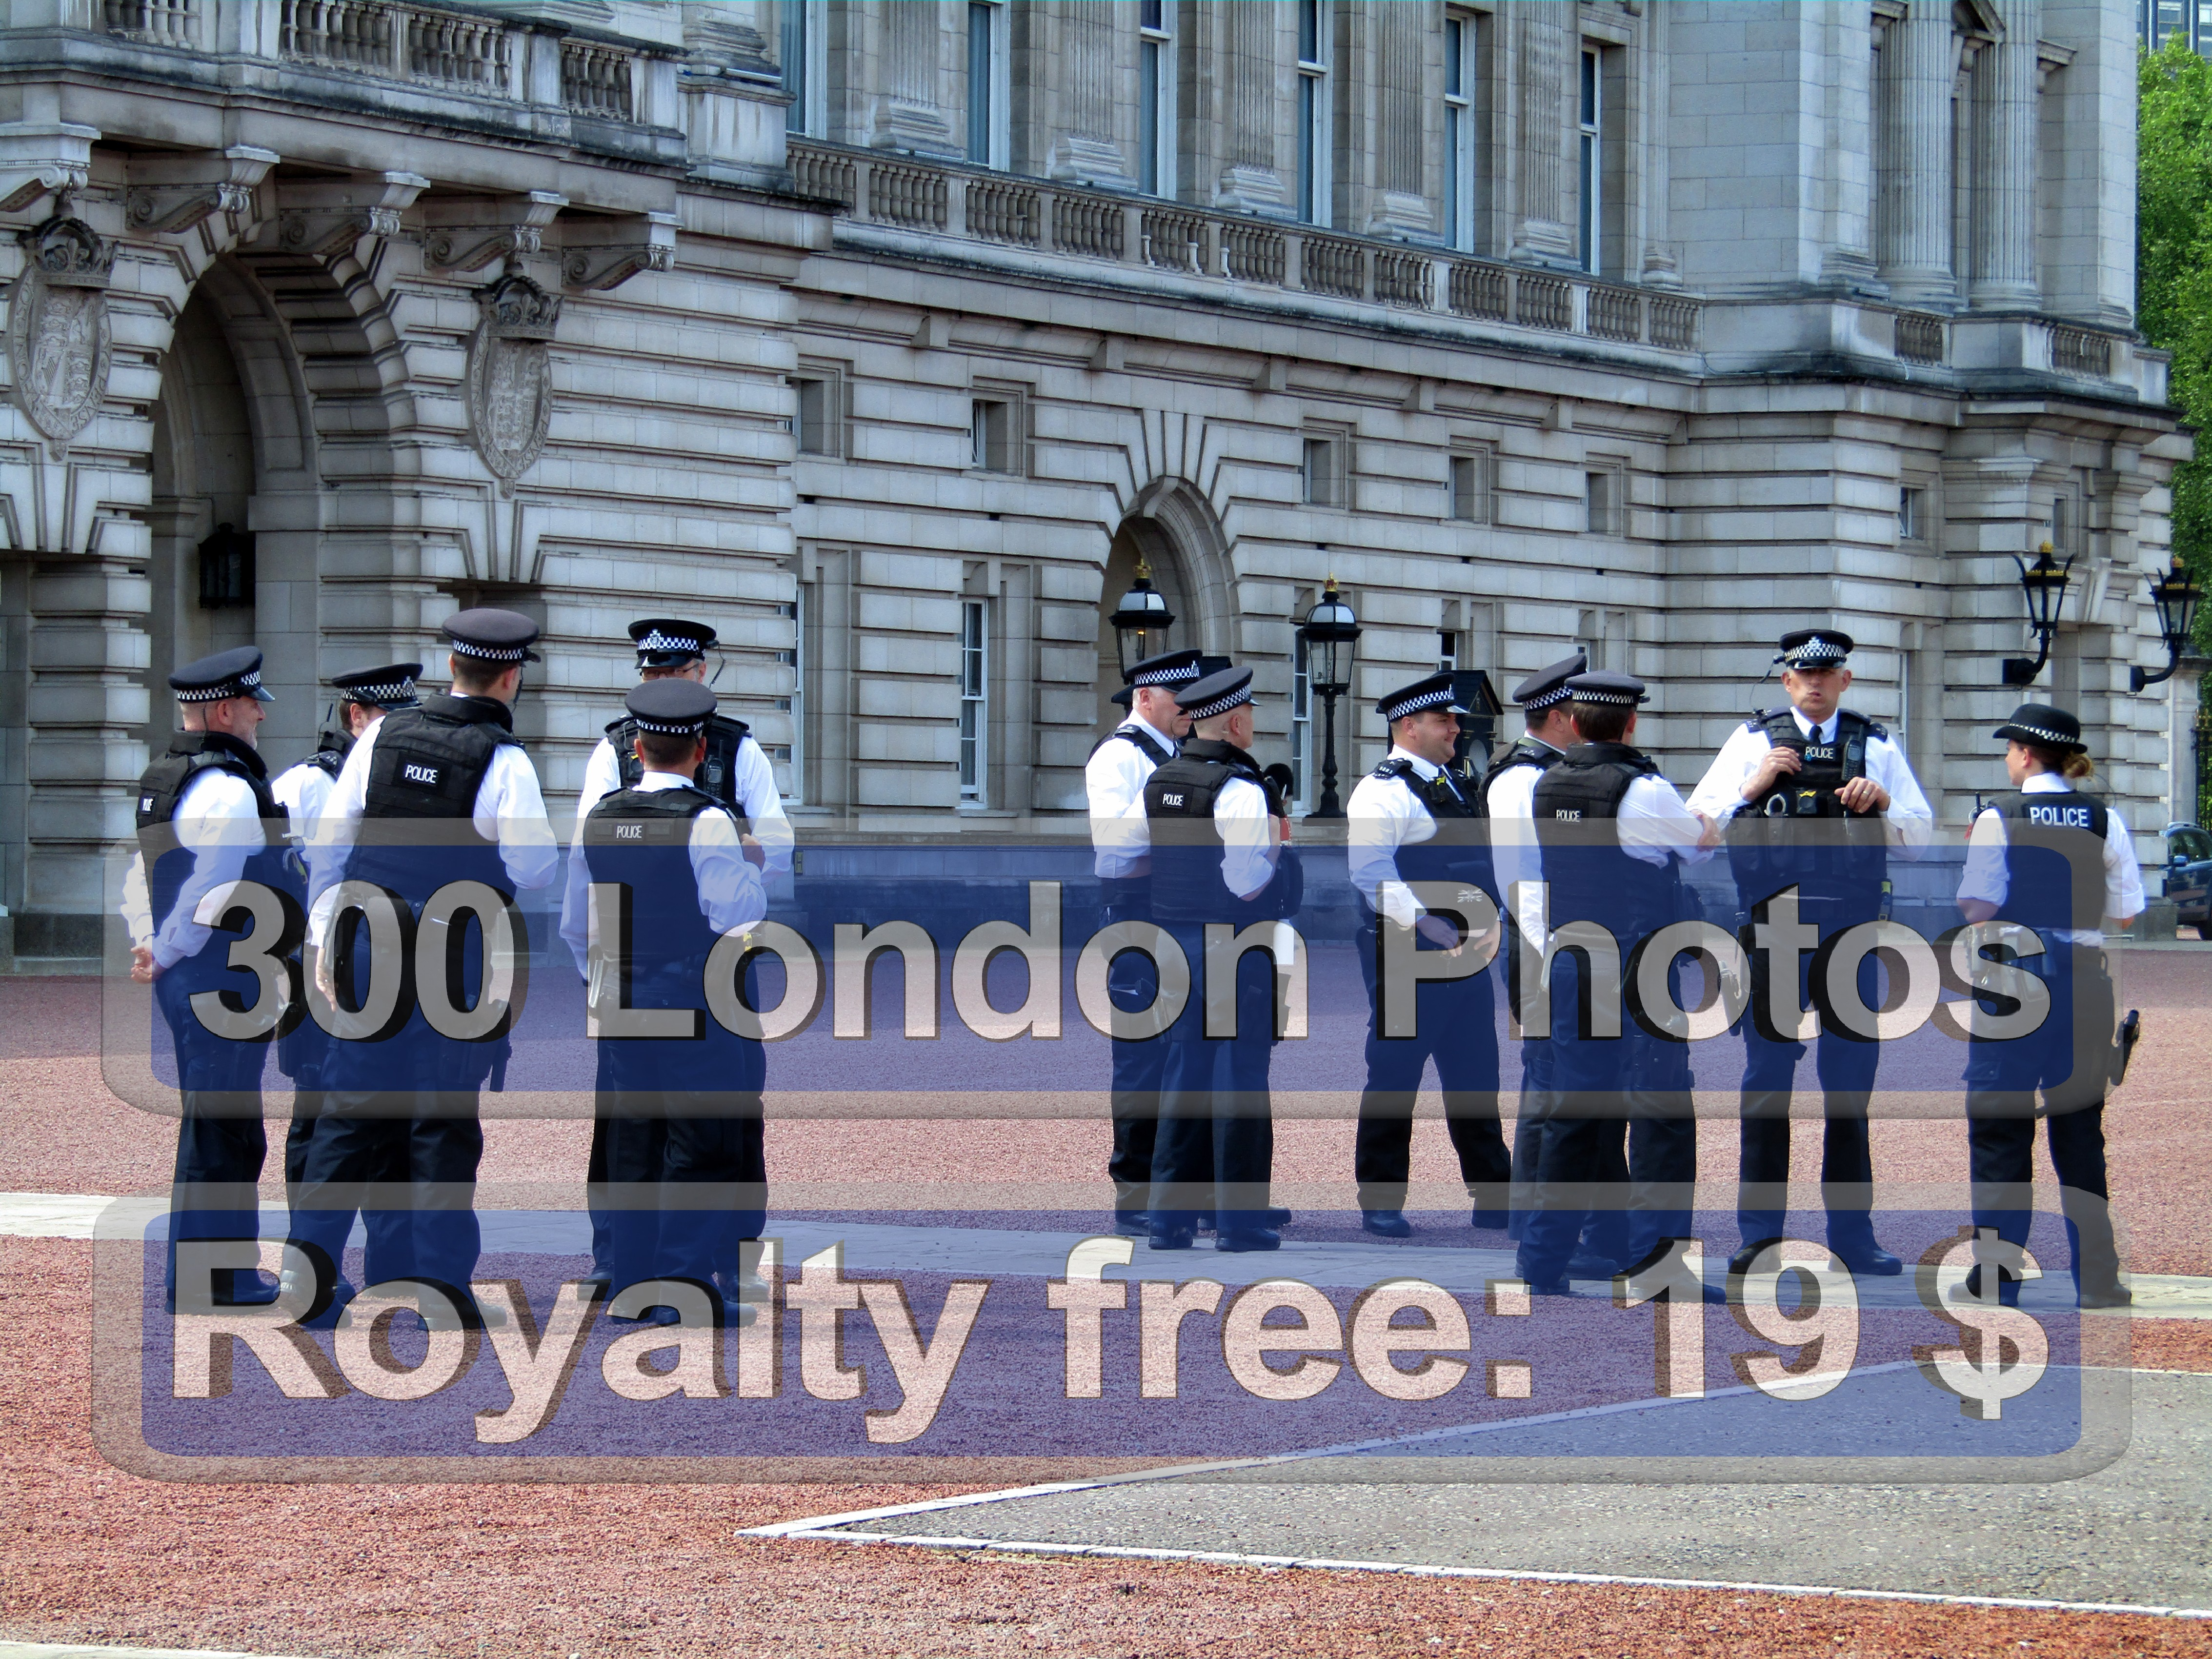 London Photo Contest